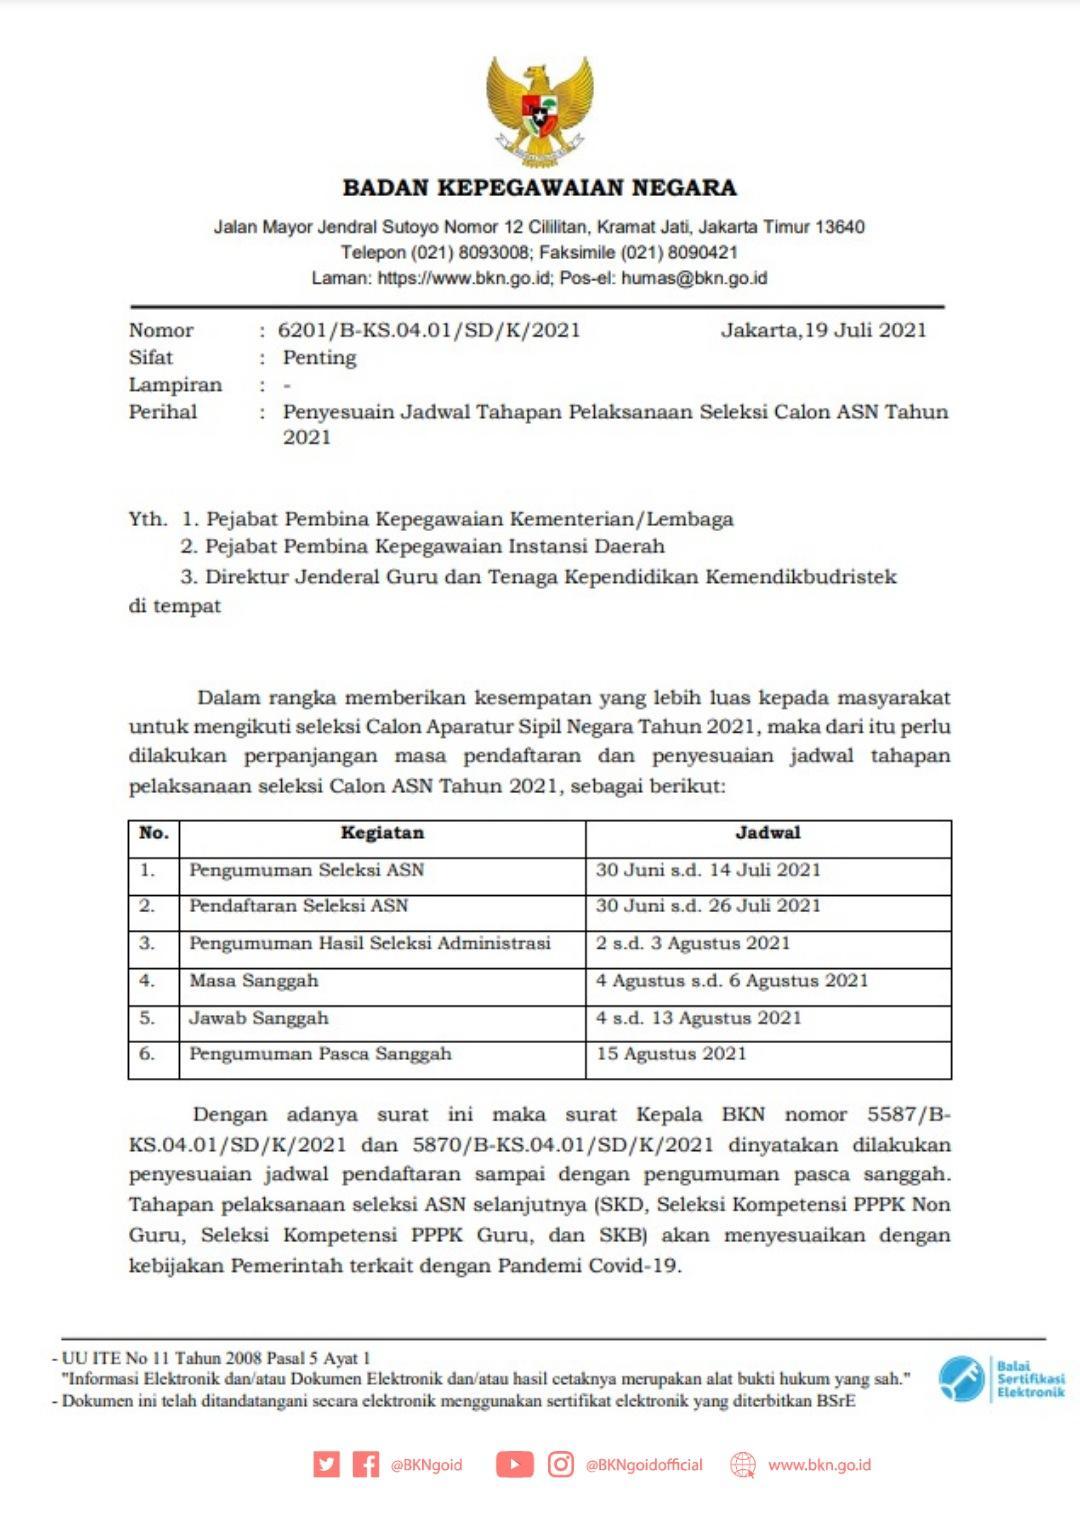 Surat BKN tentang perpanjangam jadwal pendaftaran CASN 2021.